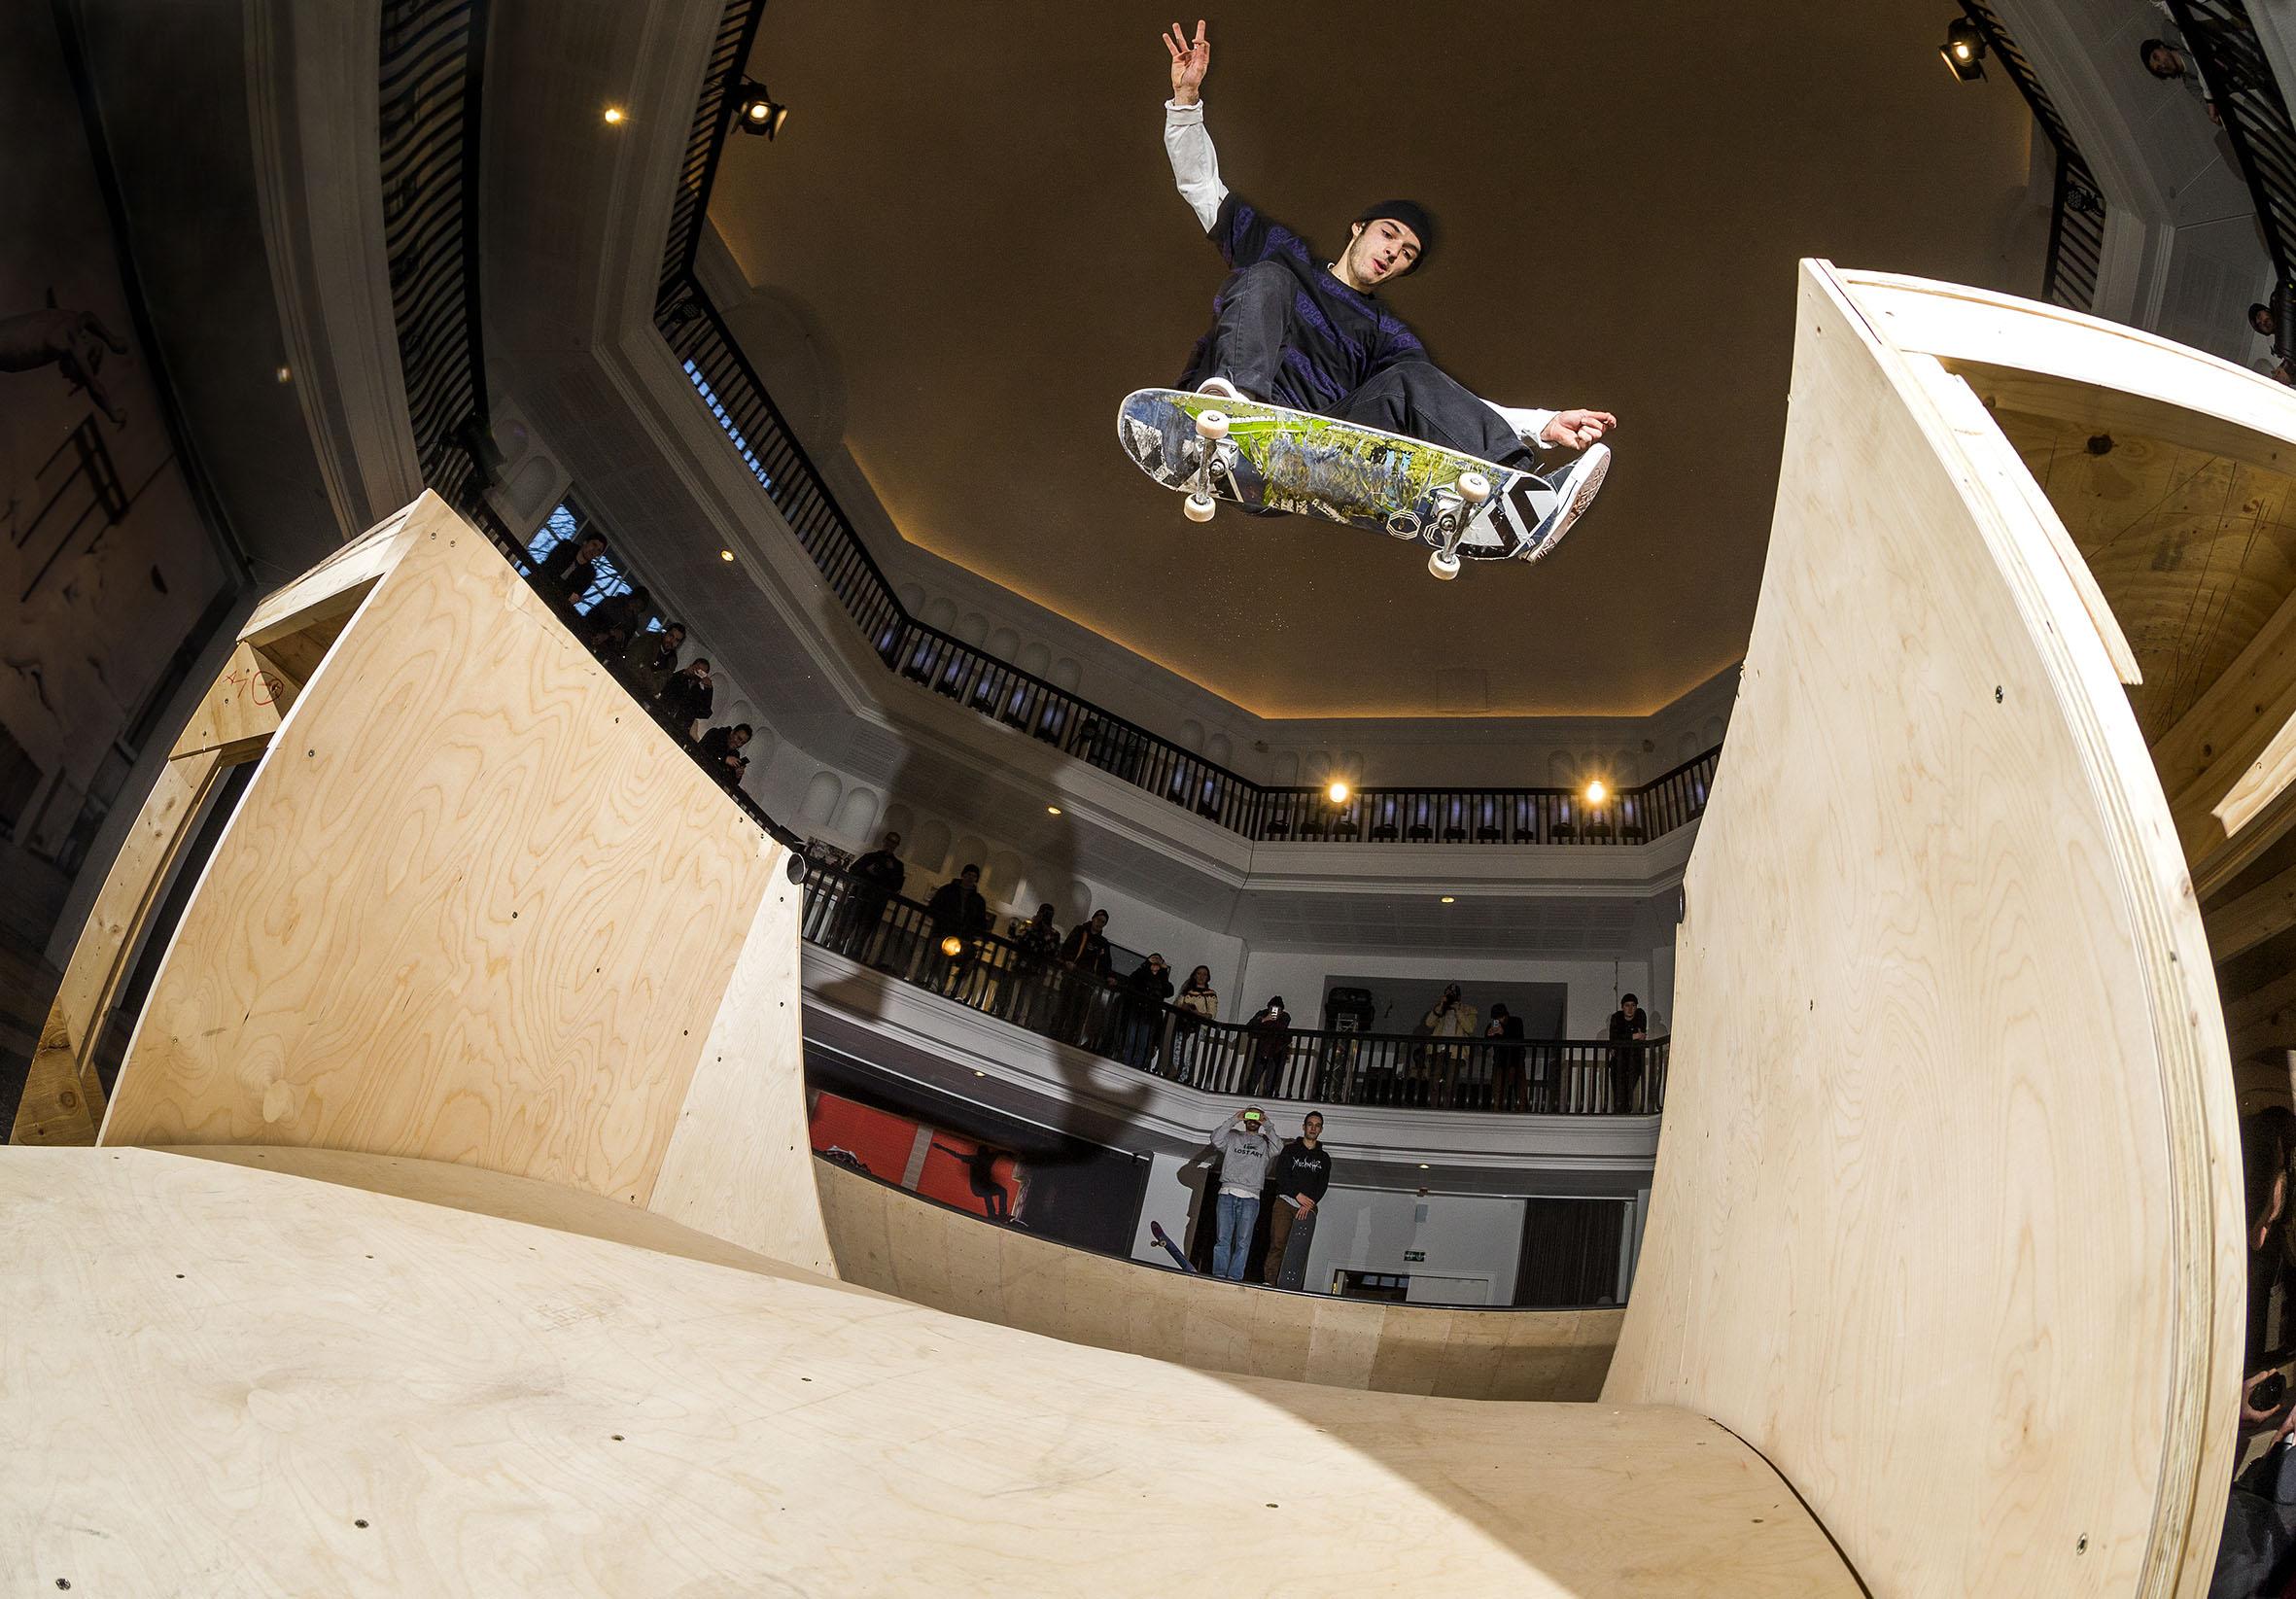 Remy Taveira - kickflip flat gap